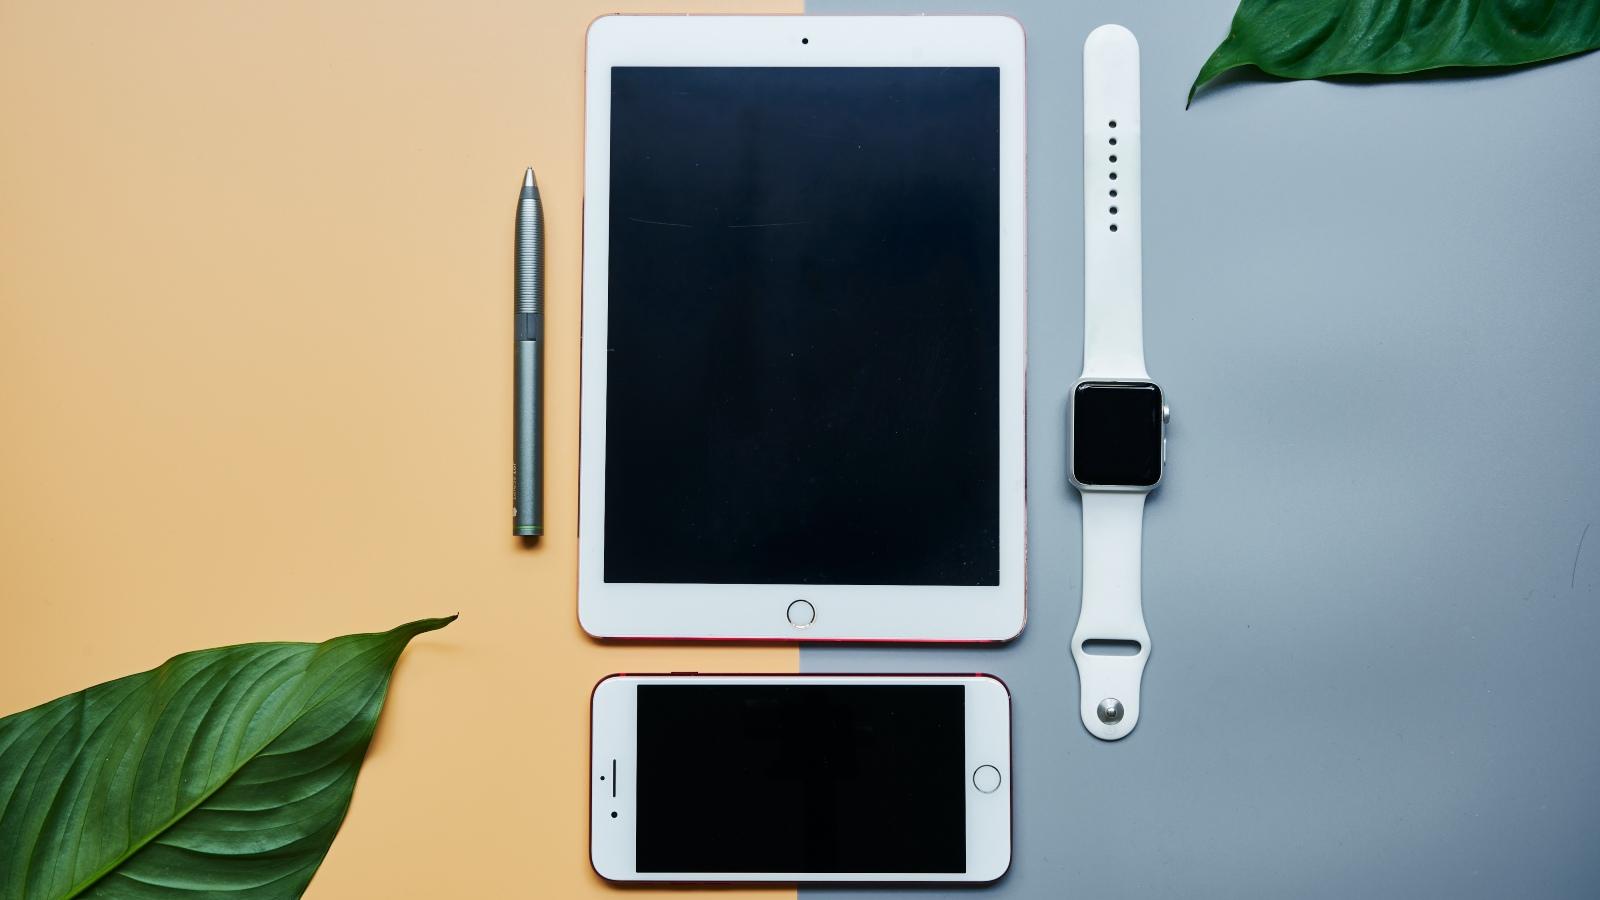 Apple, iOS, 間諜程式入侵iPhone, 無點擊連結都中招, HKBT, 香港財經時報